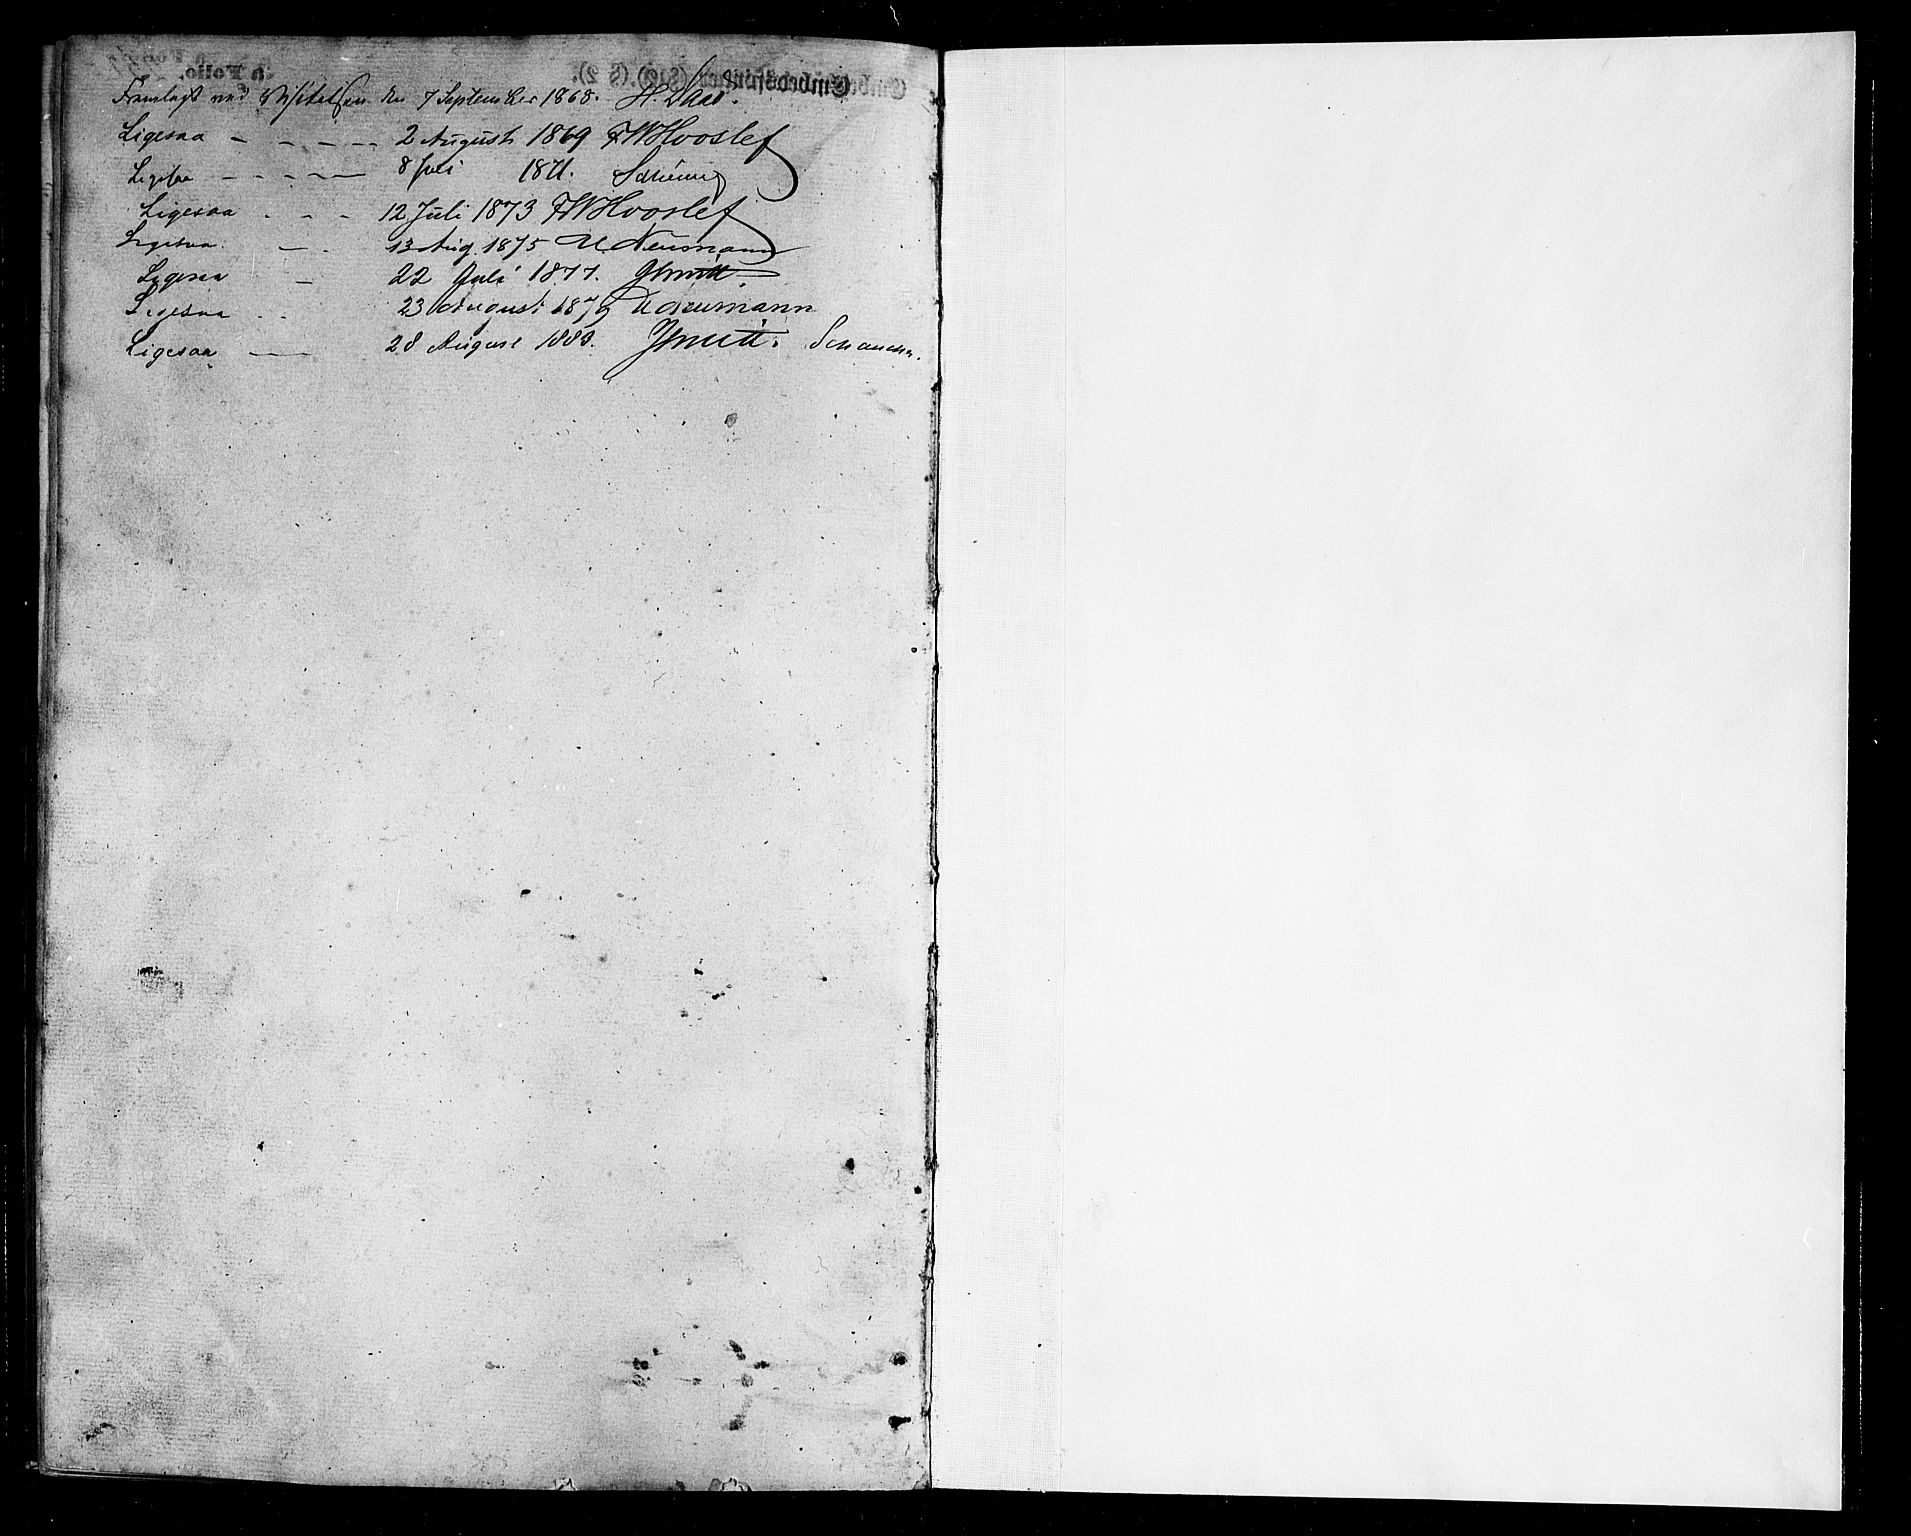 SAT, Ministerialprotokoller, klokkerbøker og fødselsregistre - Nordland, 803/L0075: Klokkerbok nr. 803C02, 1867-1881